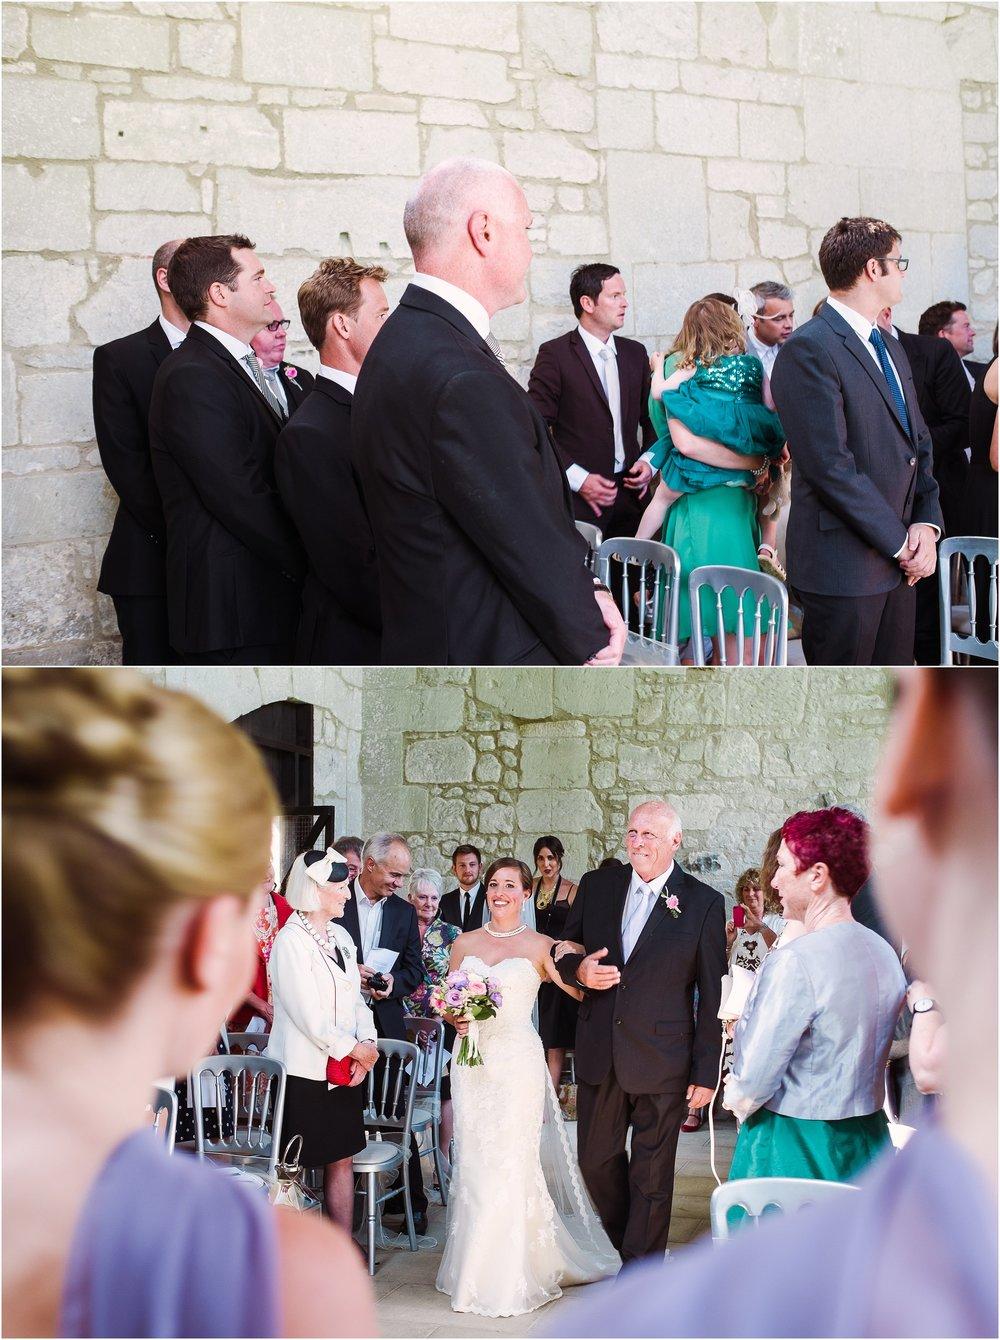 Appuldurcombe wedding_0025.jpg